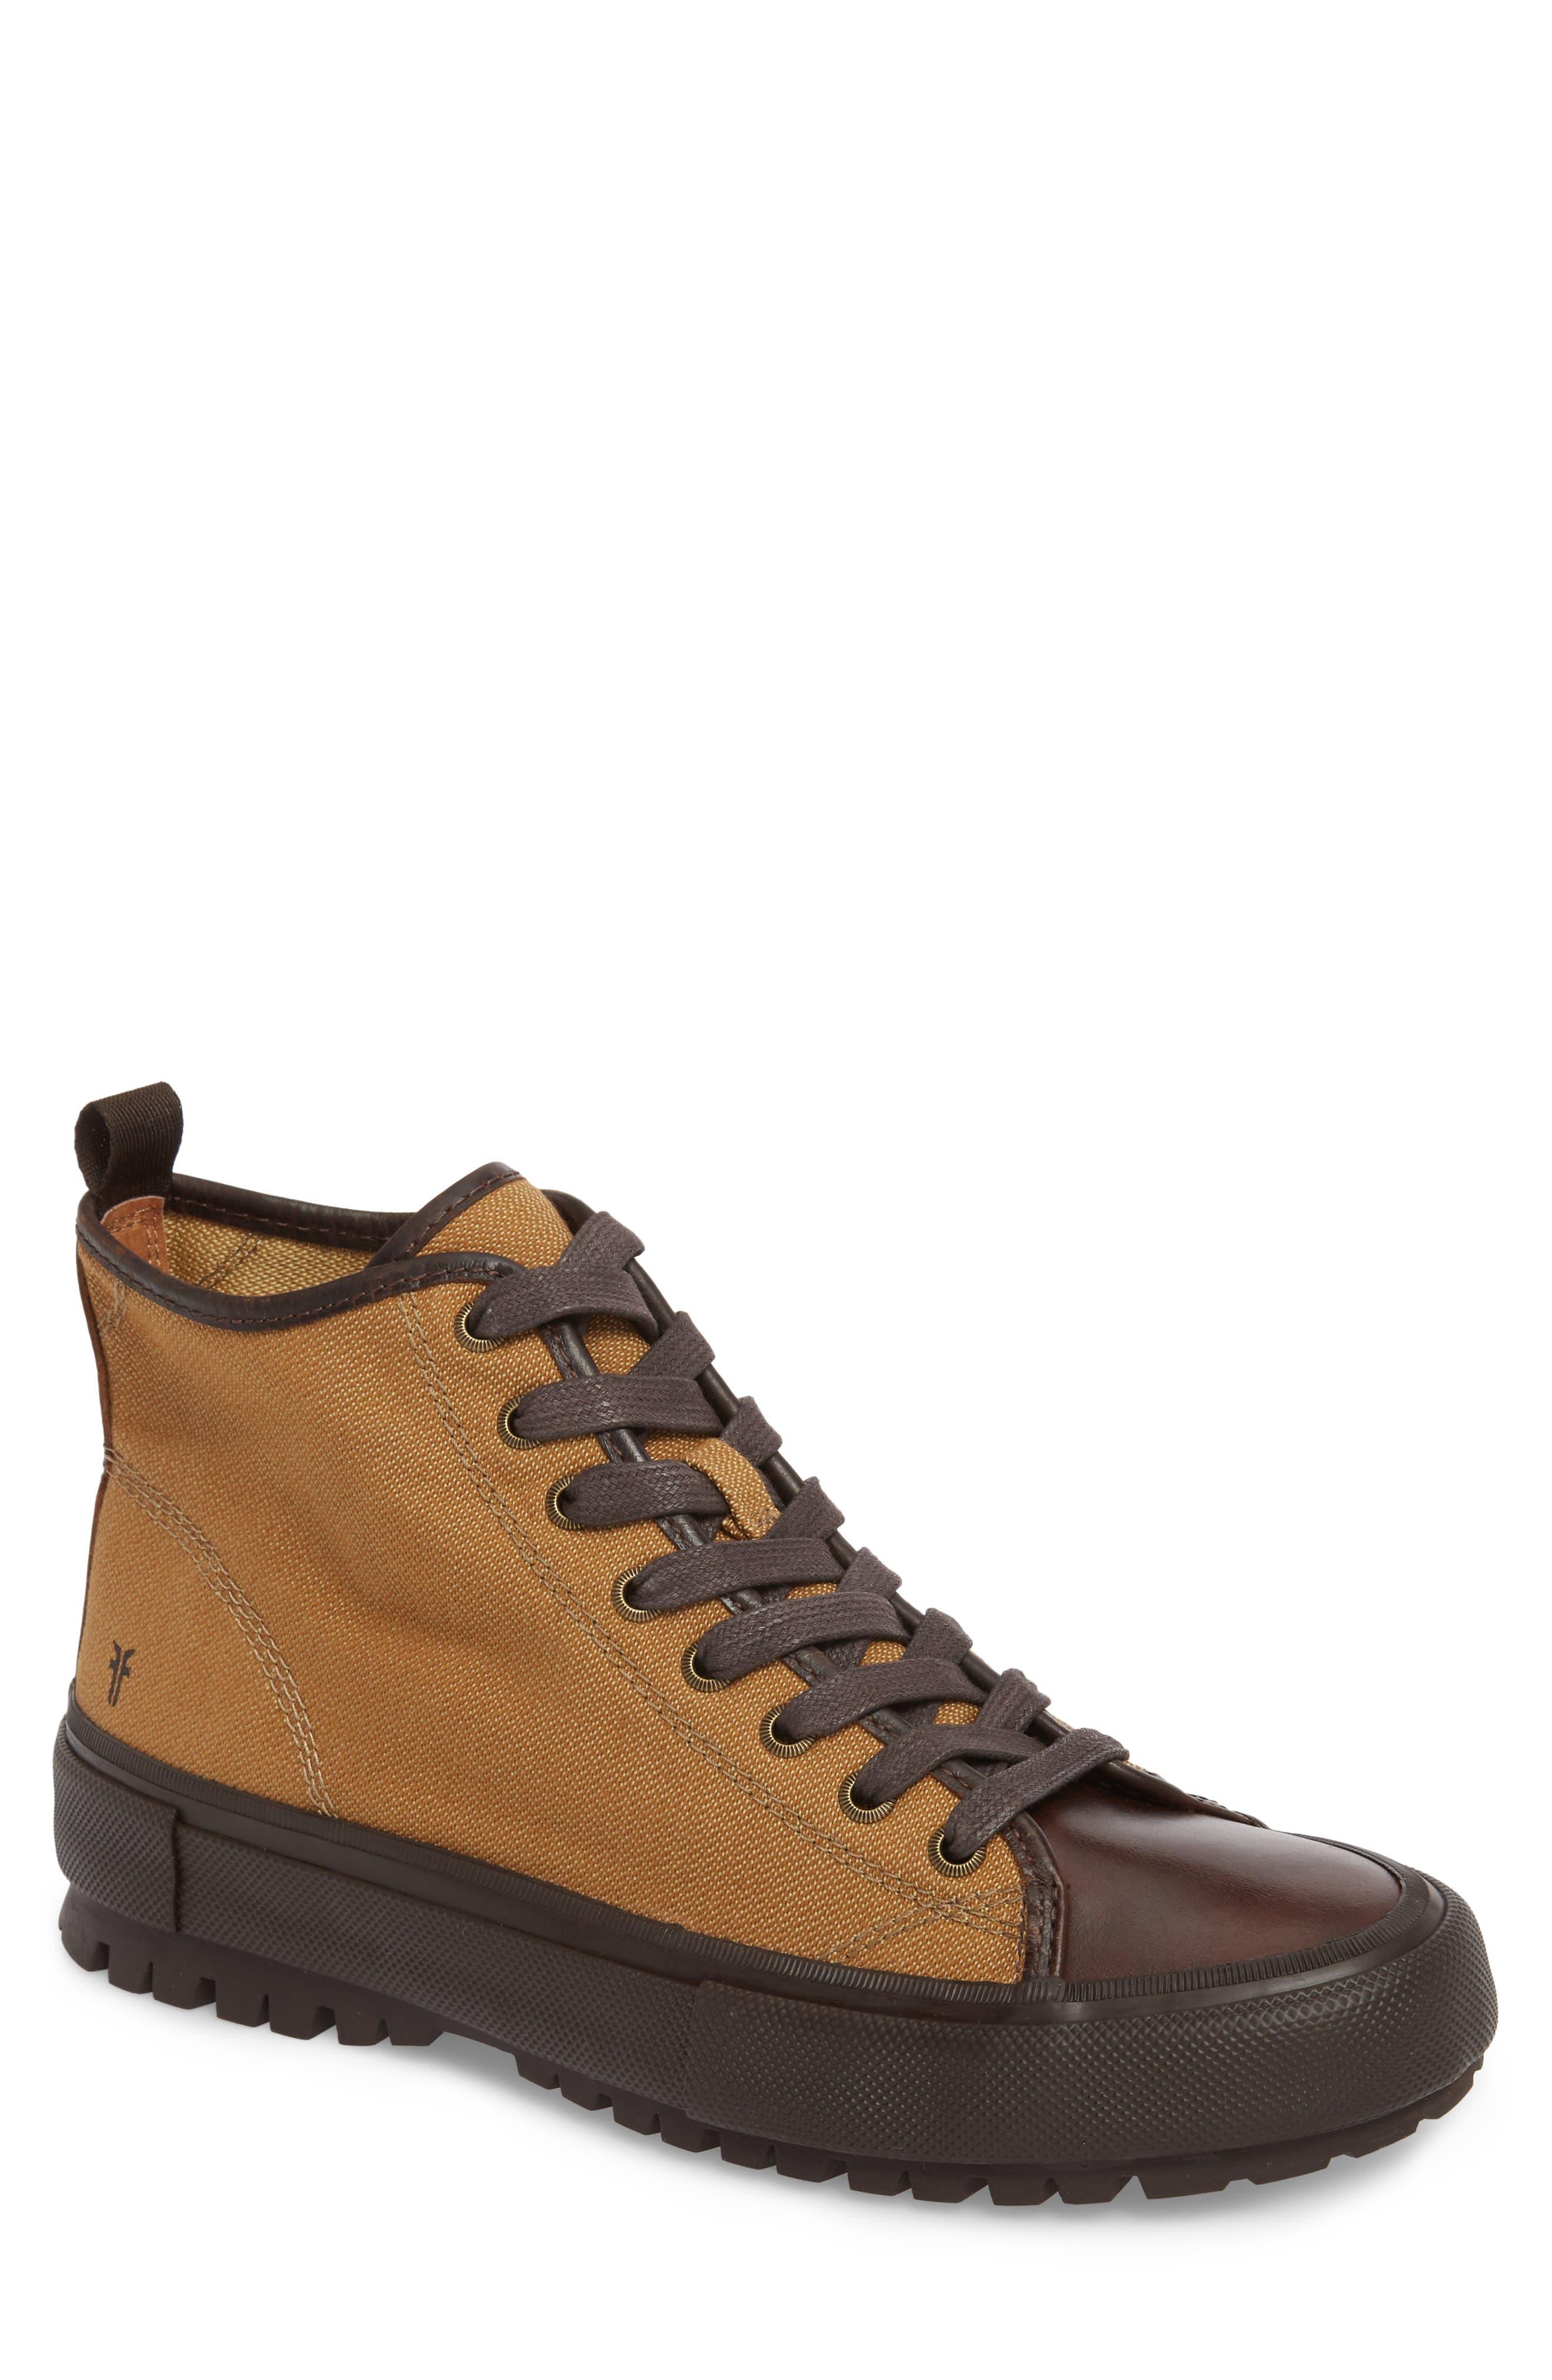 Ryan Lugged Sneaker Boot,                             Main thumbnail 1, color,                             Tan Canvas